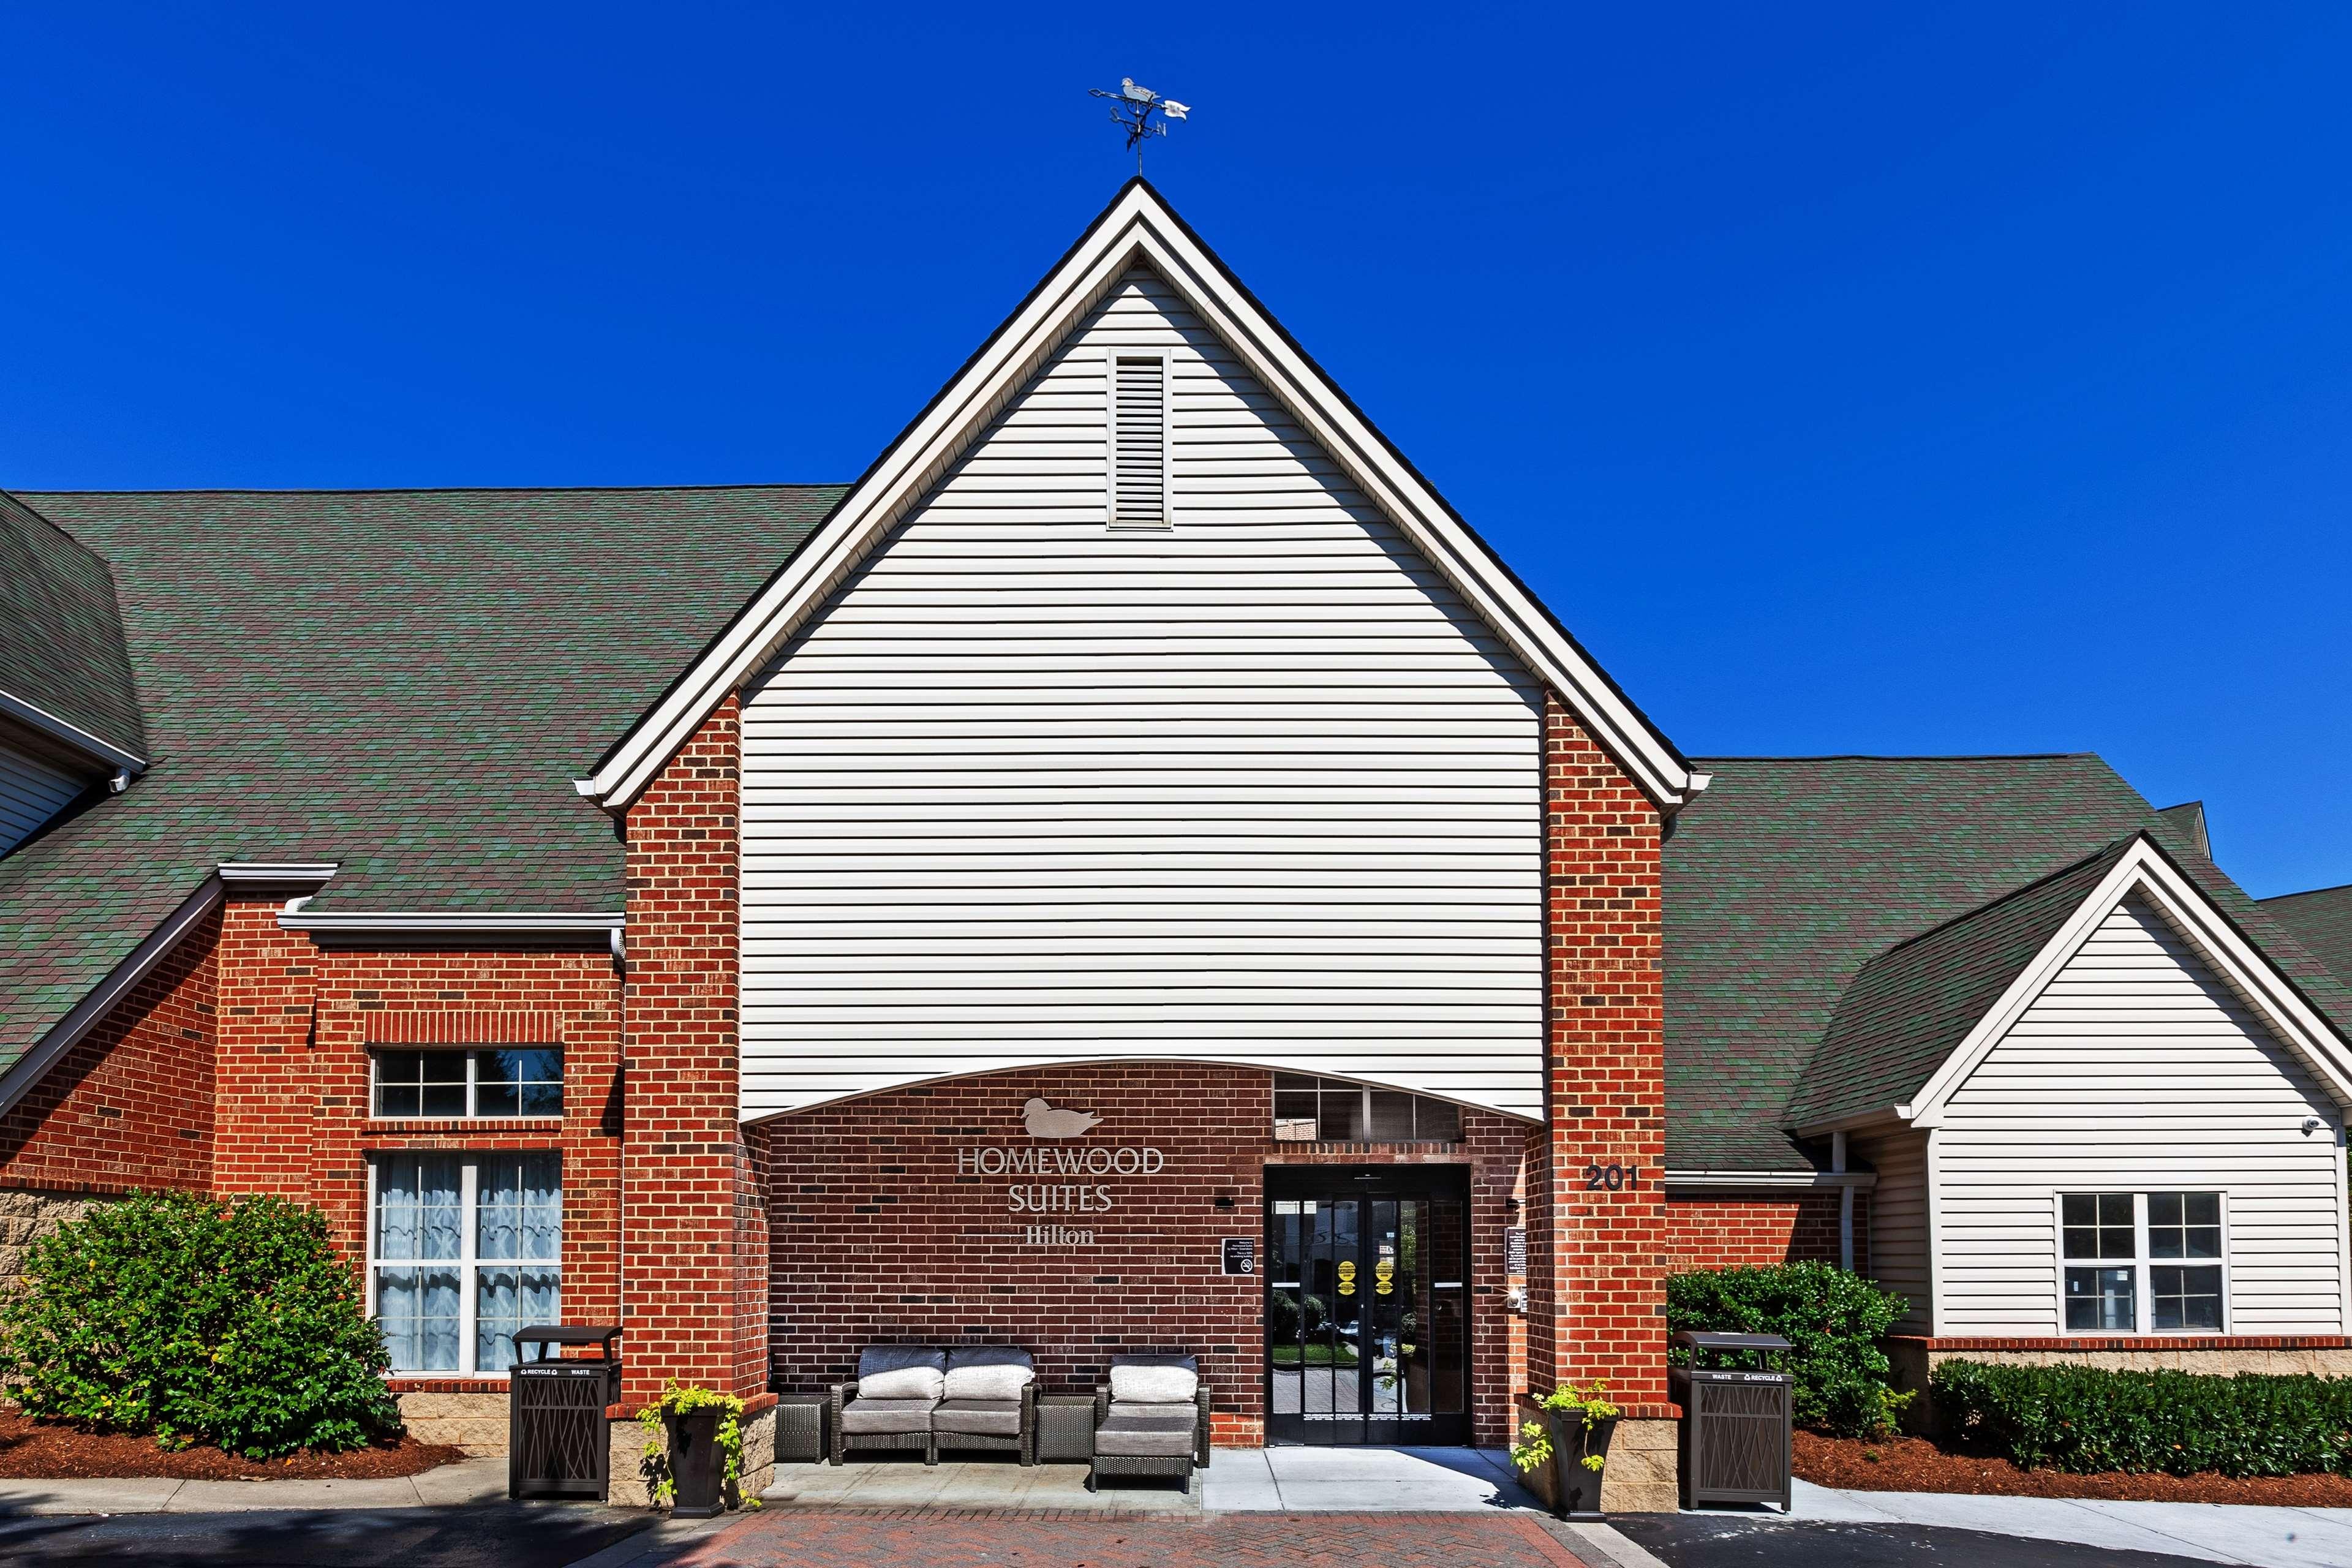 Homewood Suites Hilton Greensboro Centreport Hotels Amp Motels Mapquest